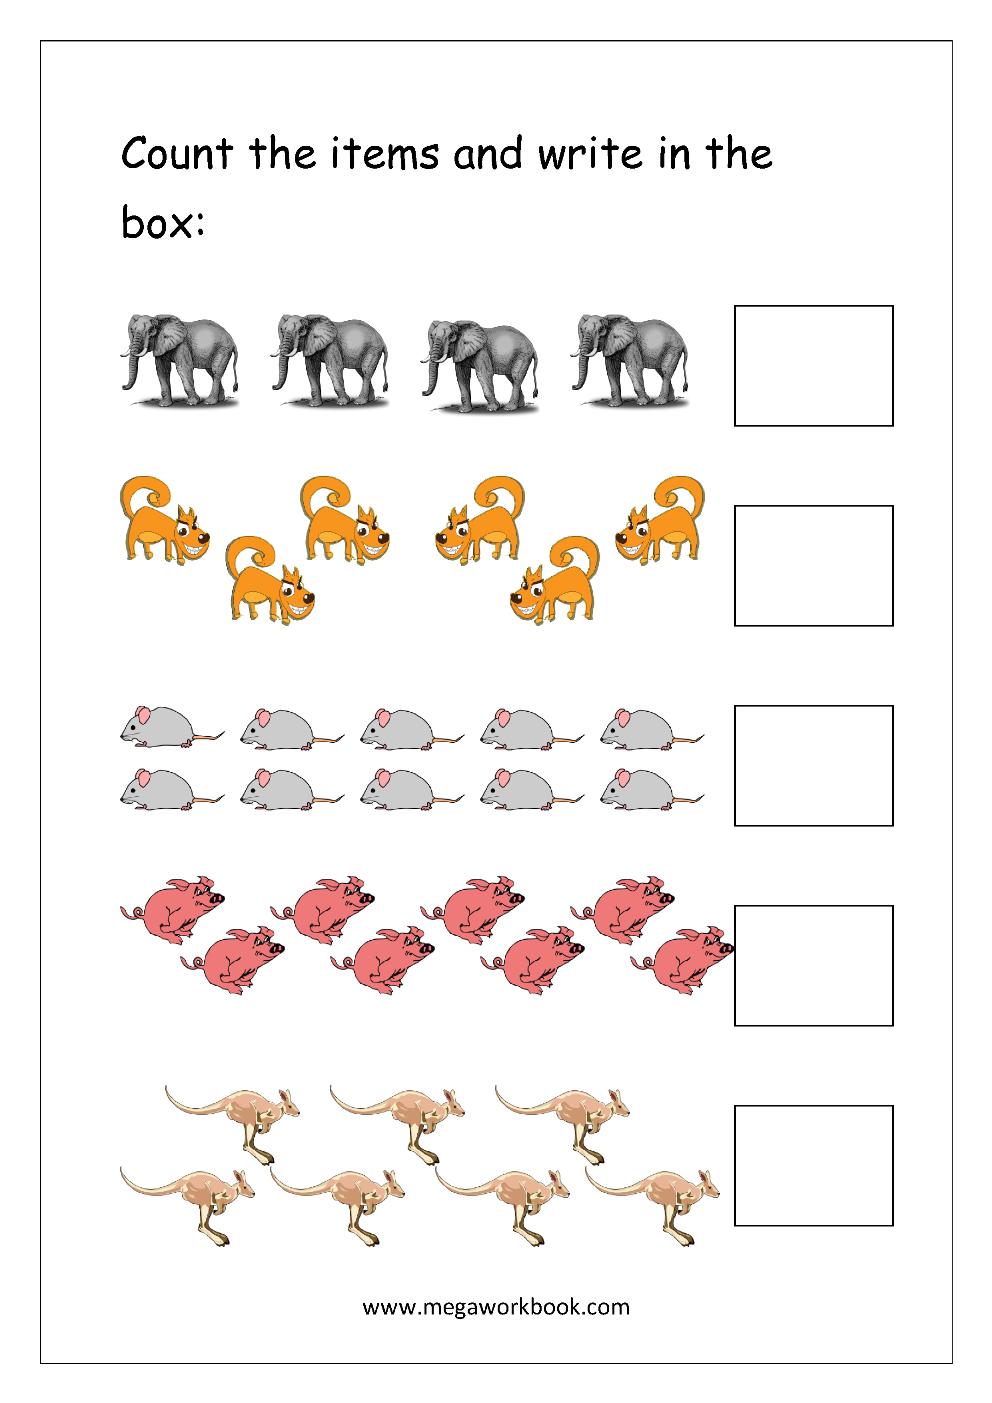 Strong Em Math Worksheet Count And Write 1 10 Em Strong Kids Math Worksheets Free Printable Math Worksheets Kindergarten Math Worksheets Printables [ 1403 x 992 Pixel ]